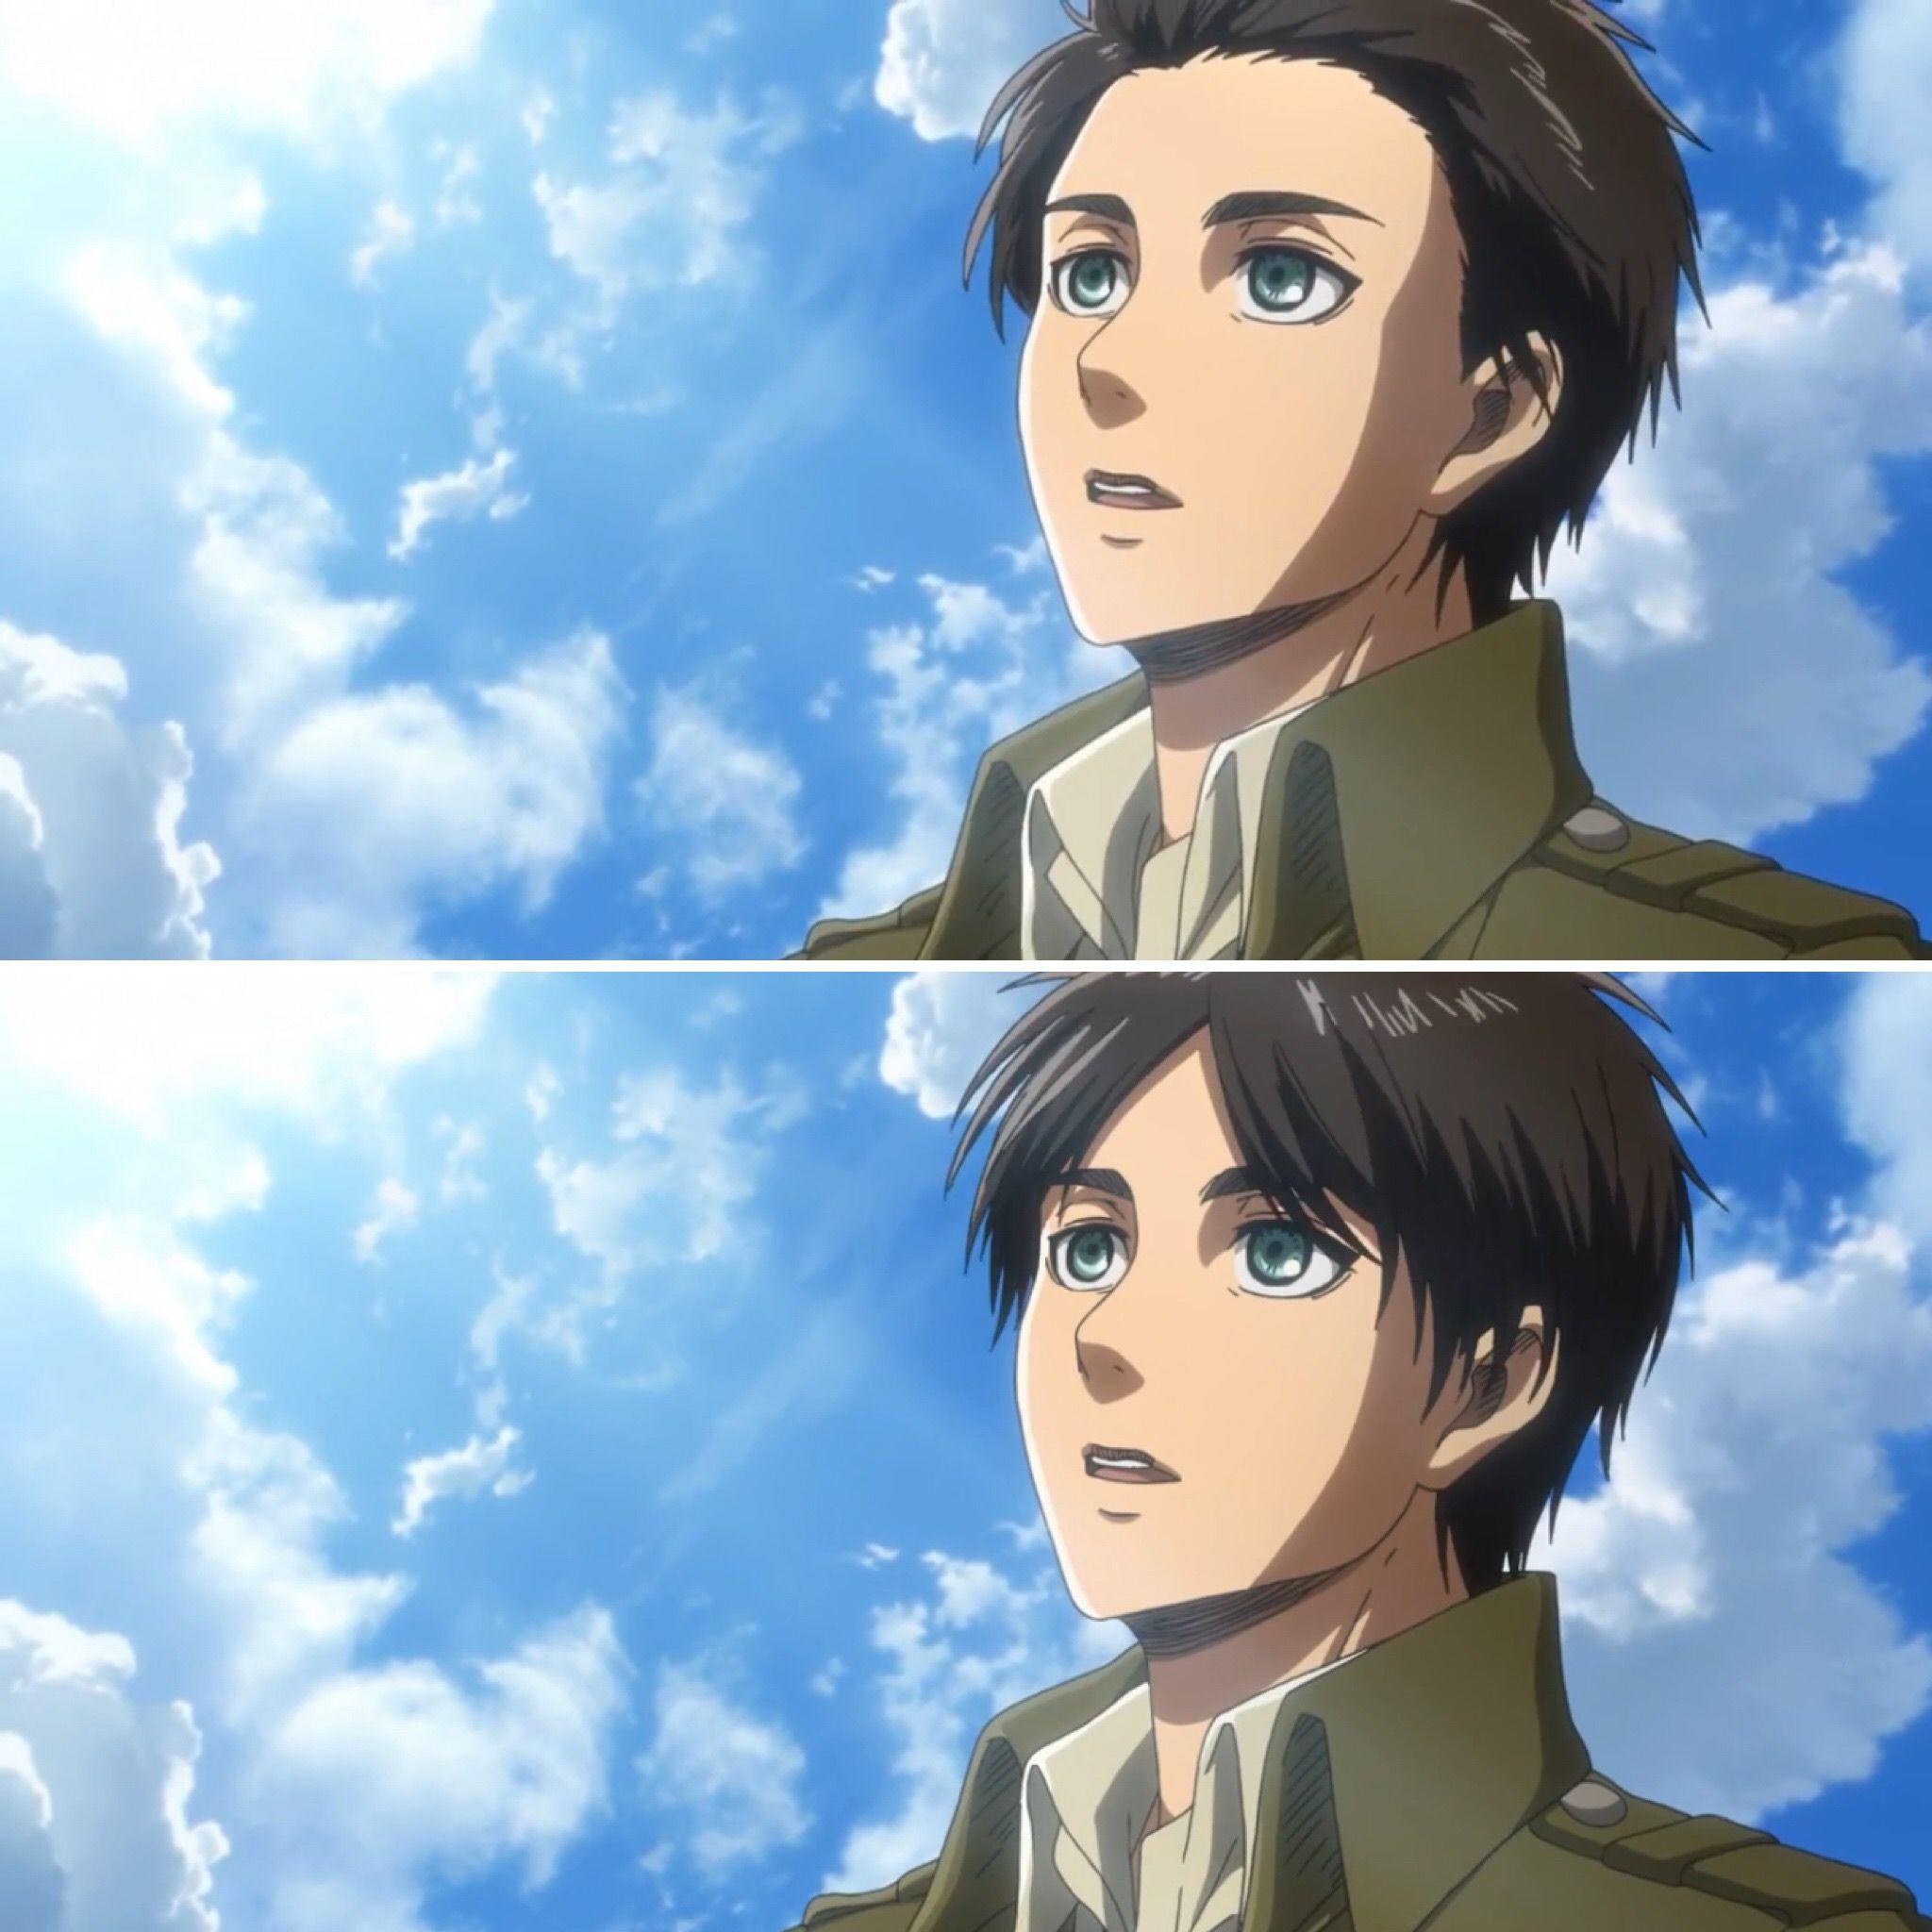 Season 3 Ep.11 Anime, Attack on titan, Eren jaeger